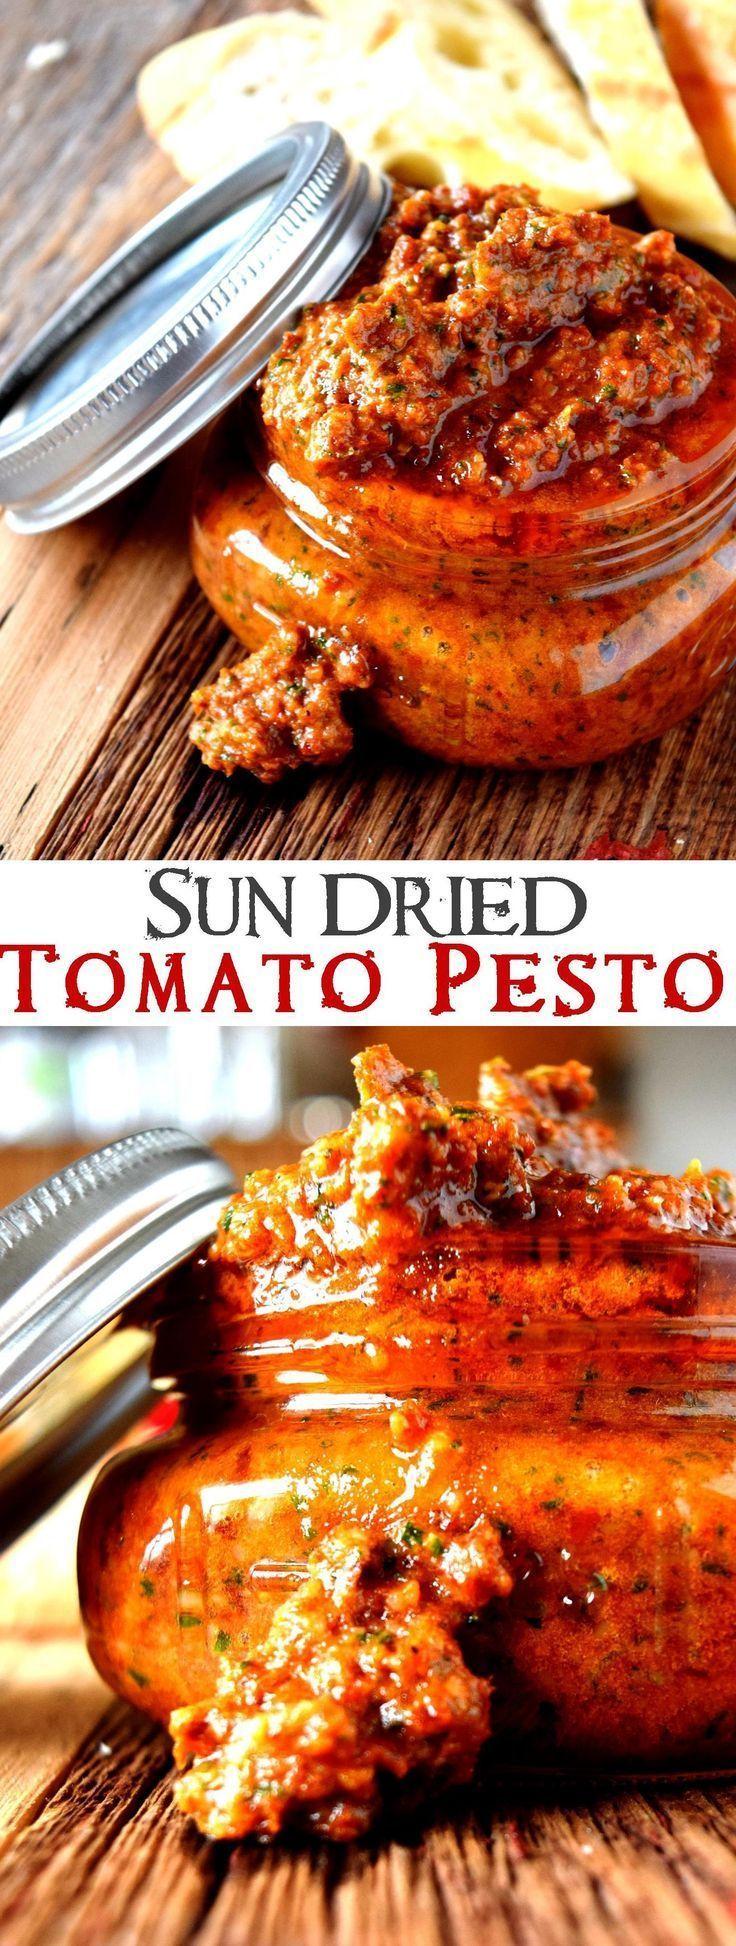 Sun Dried Tomato Pesto